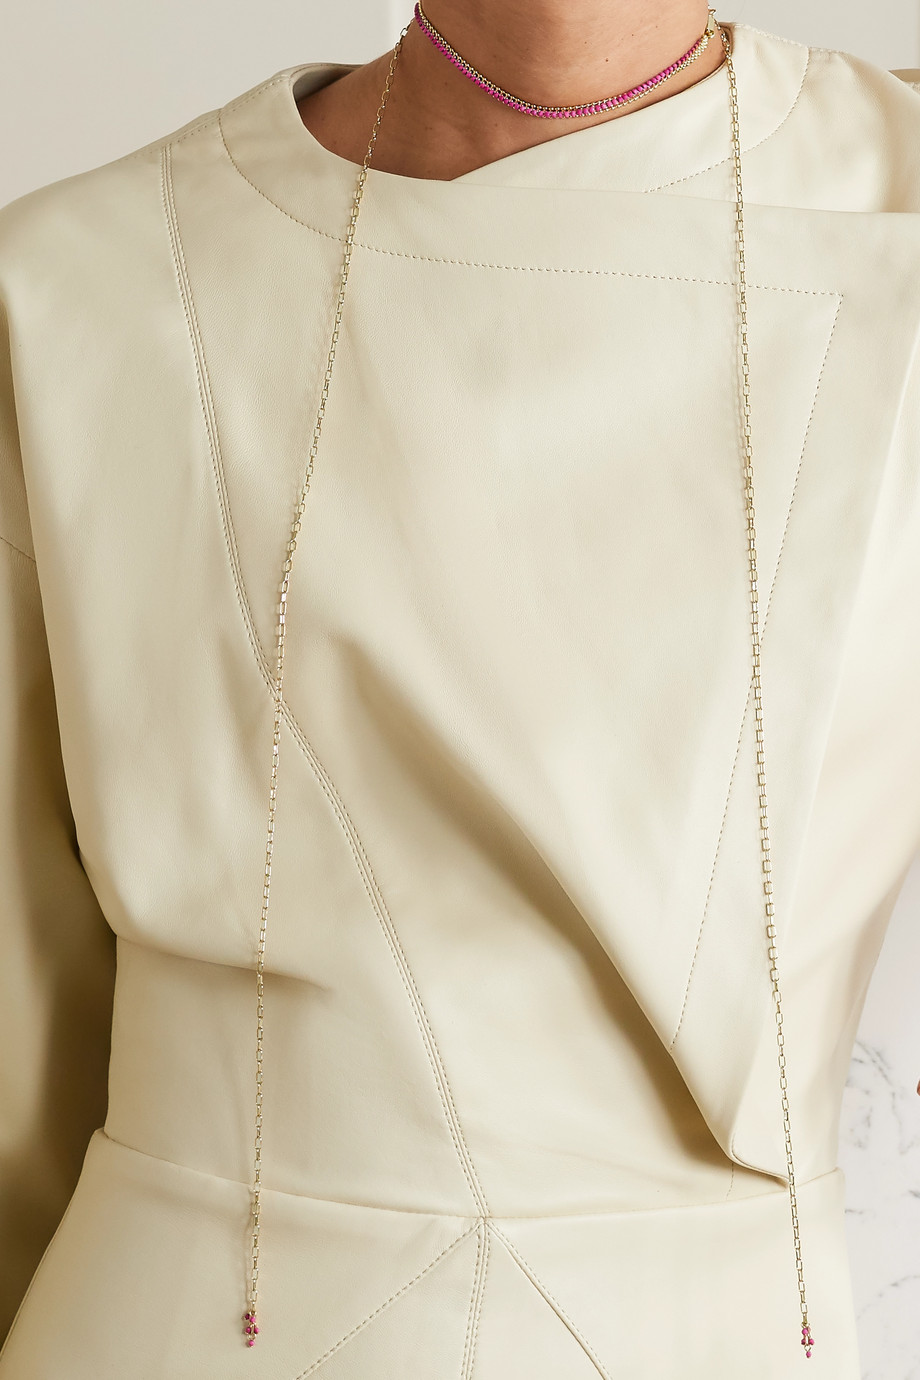 Isabel Marant Goldfarbener Choker mit Zierperlen